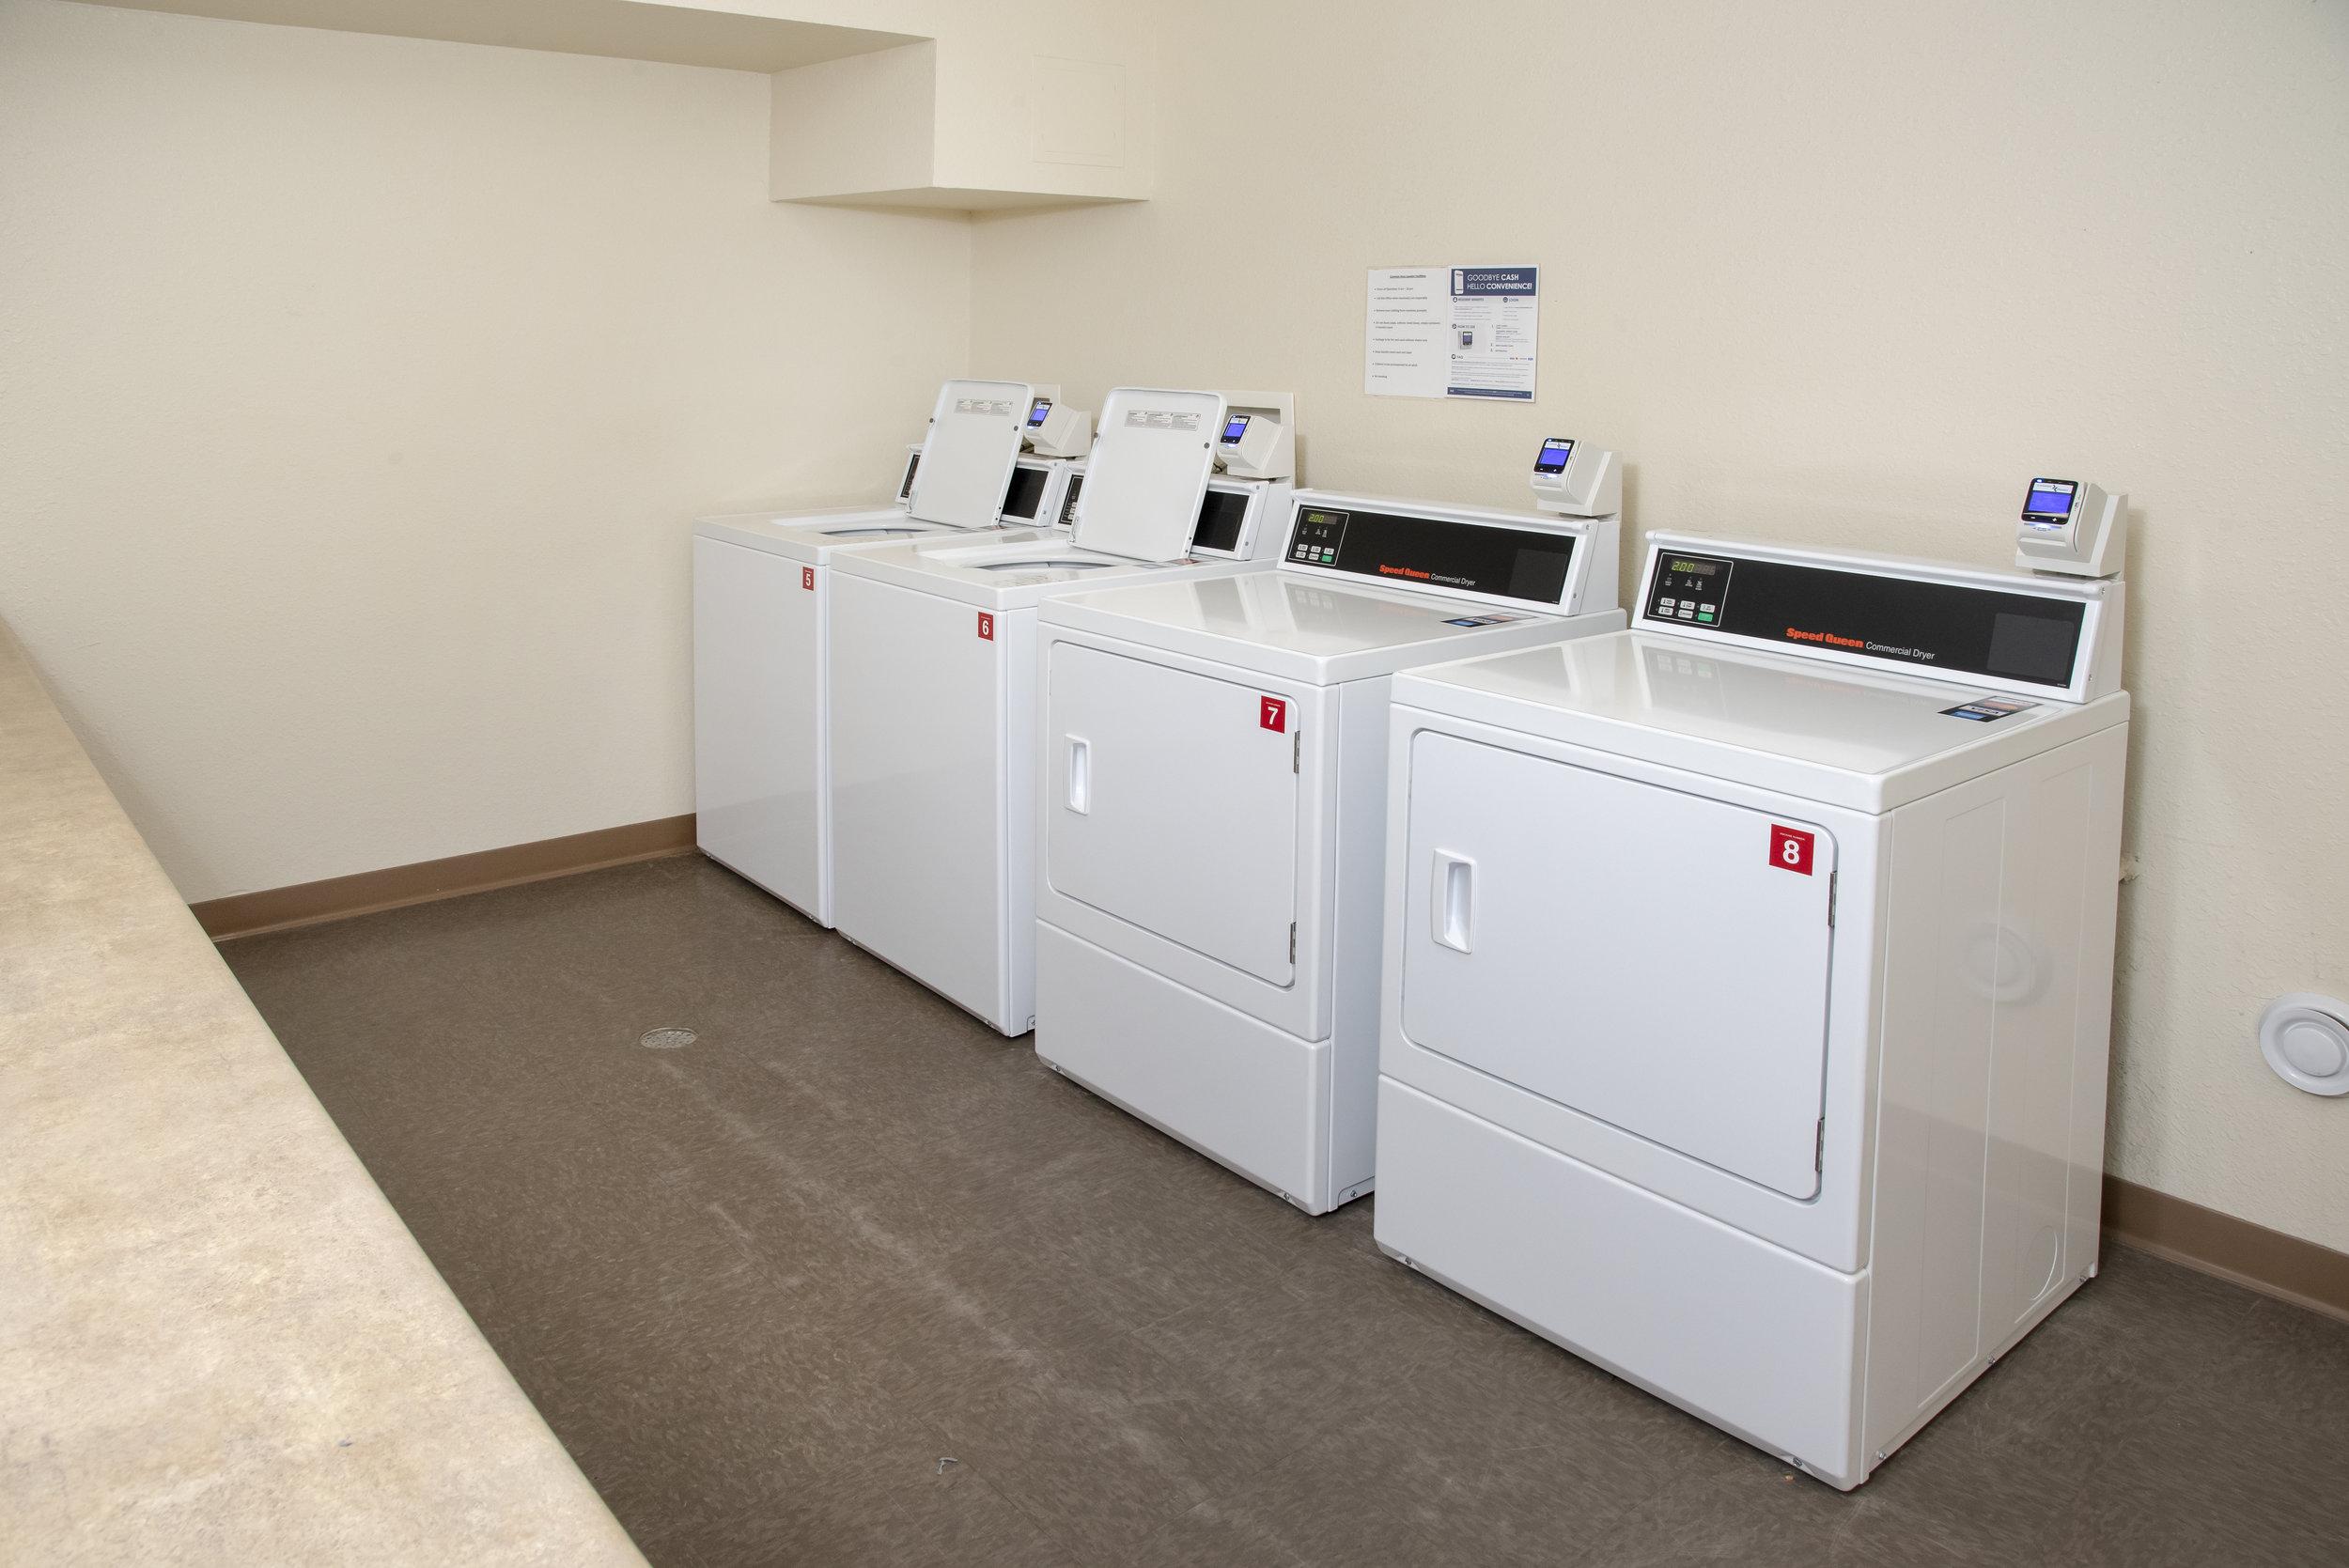 07-On-Site Coinless Laundry Facility.jpg